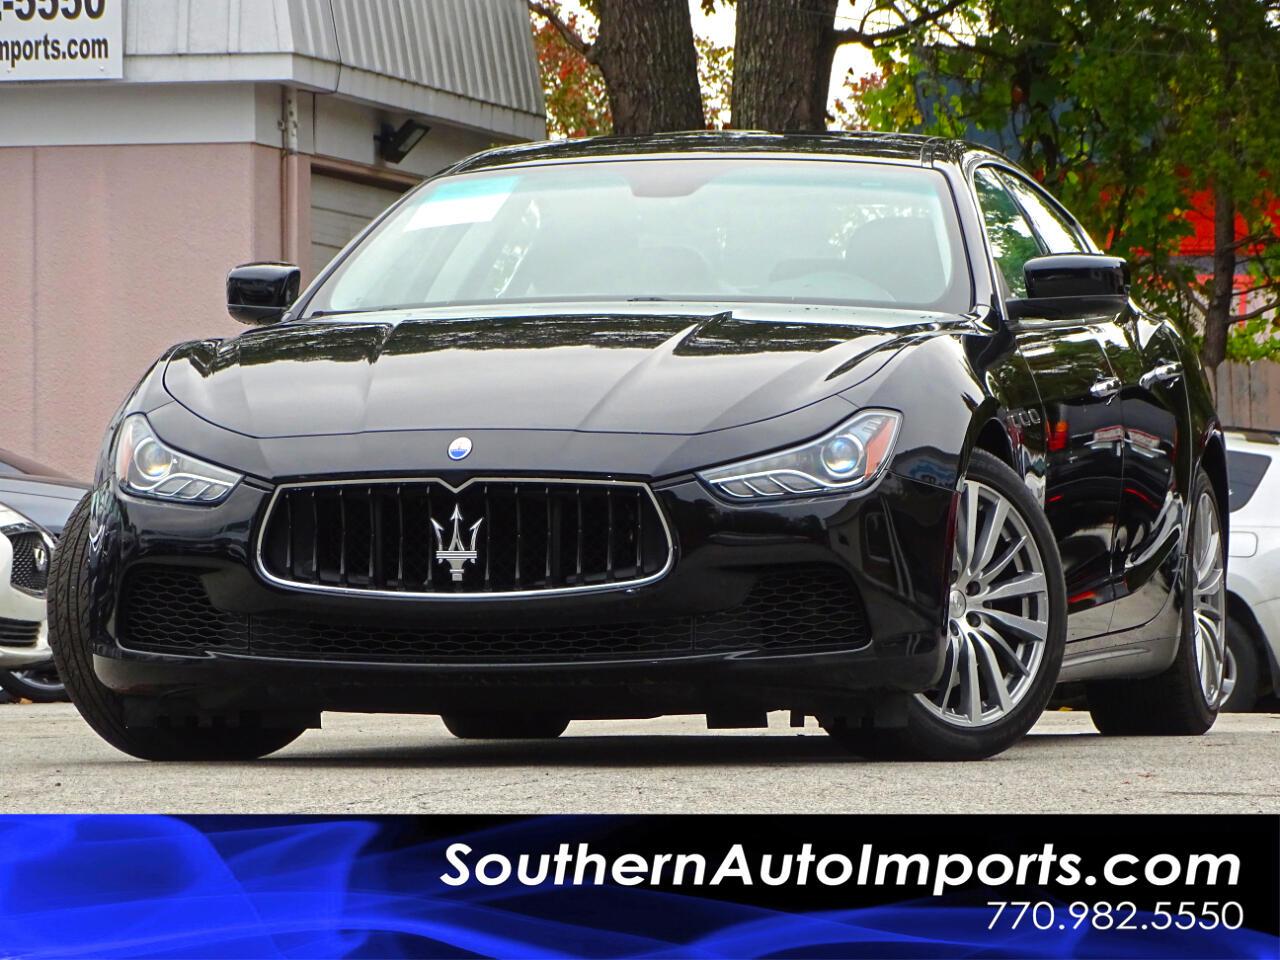 2015 Maserati Ghibli SQ4 w/Luxury Package Navigation